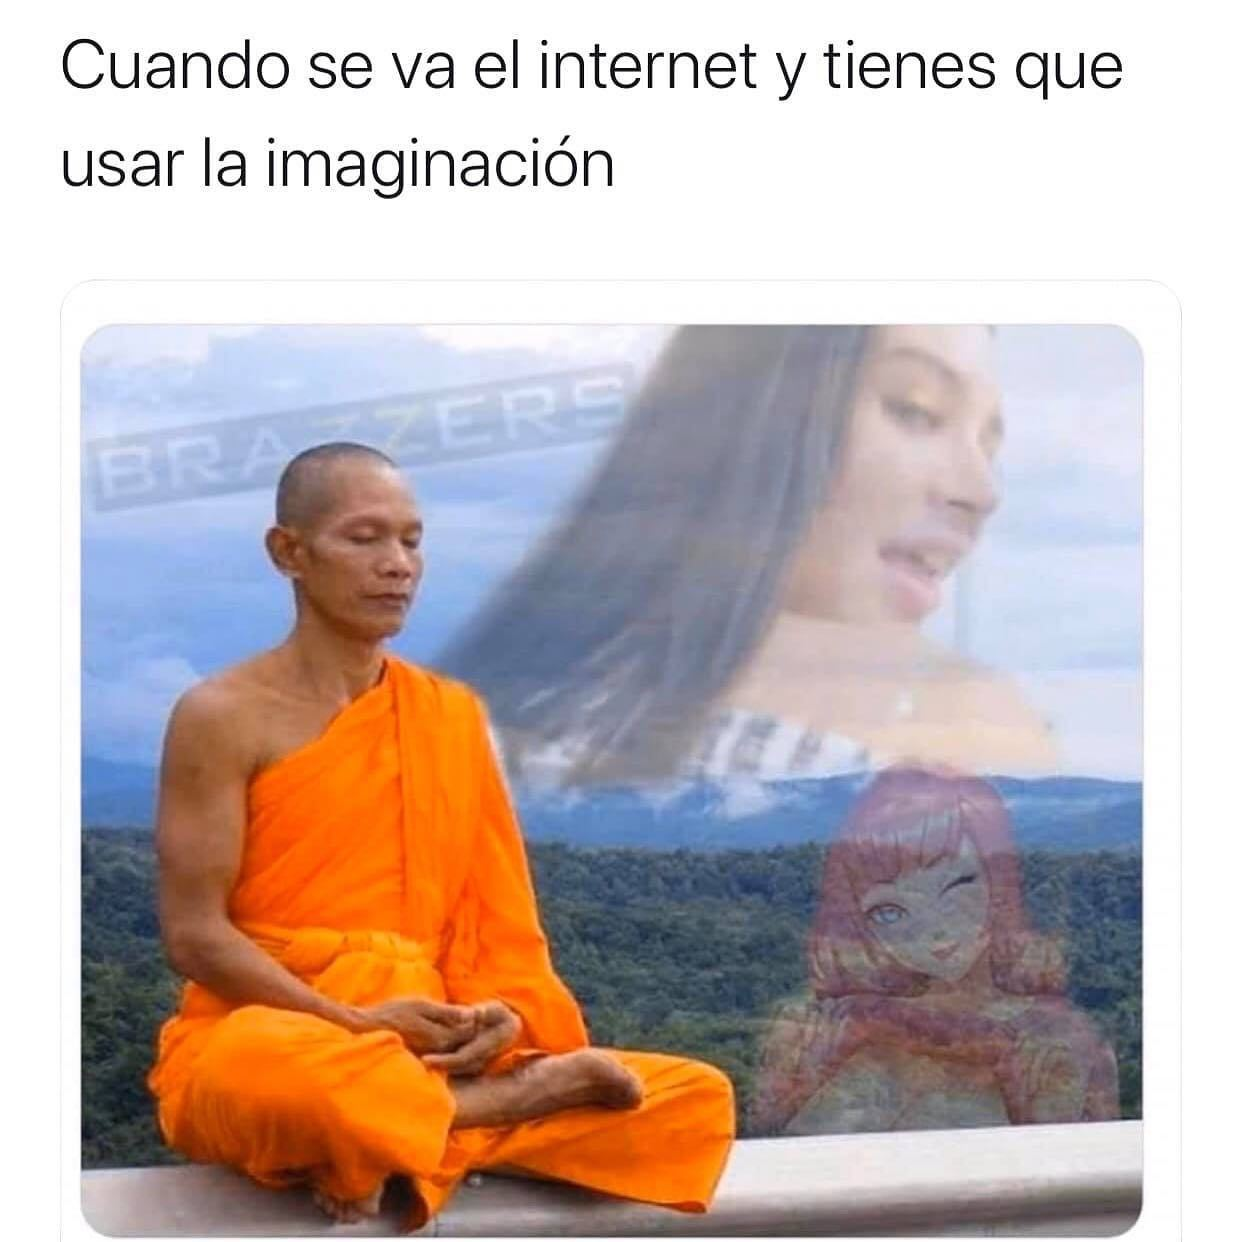 Imaginacion - meme